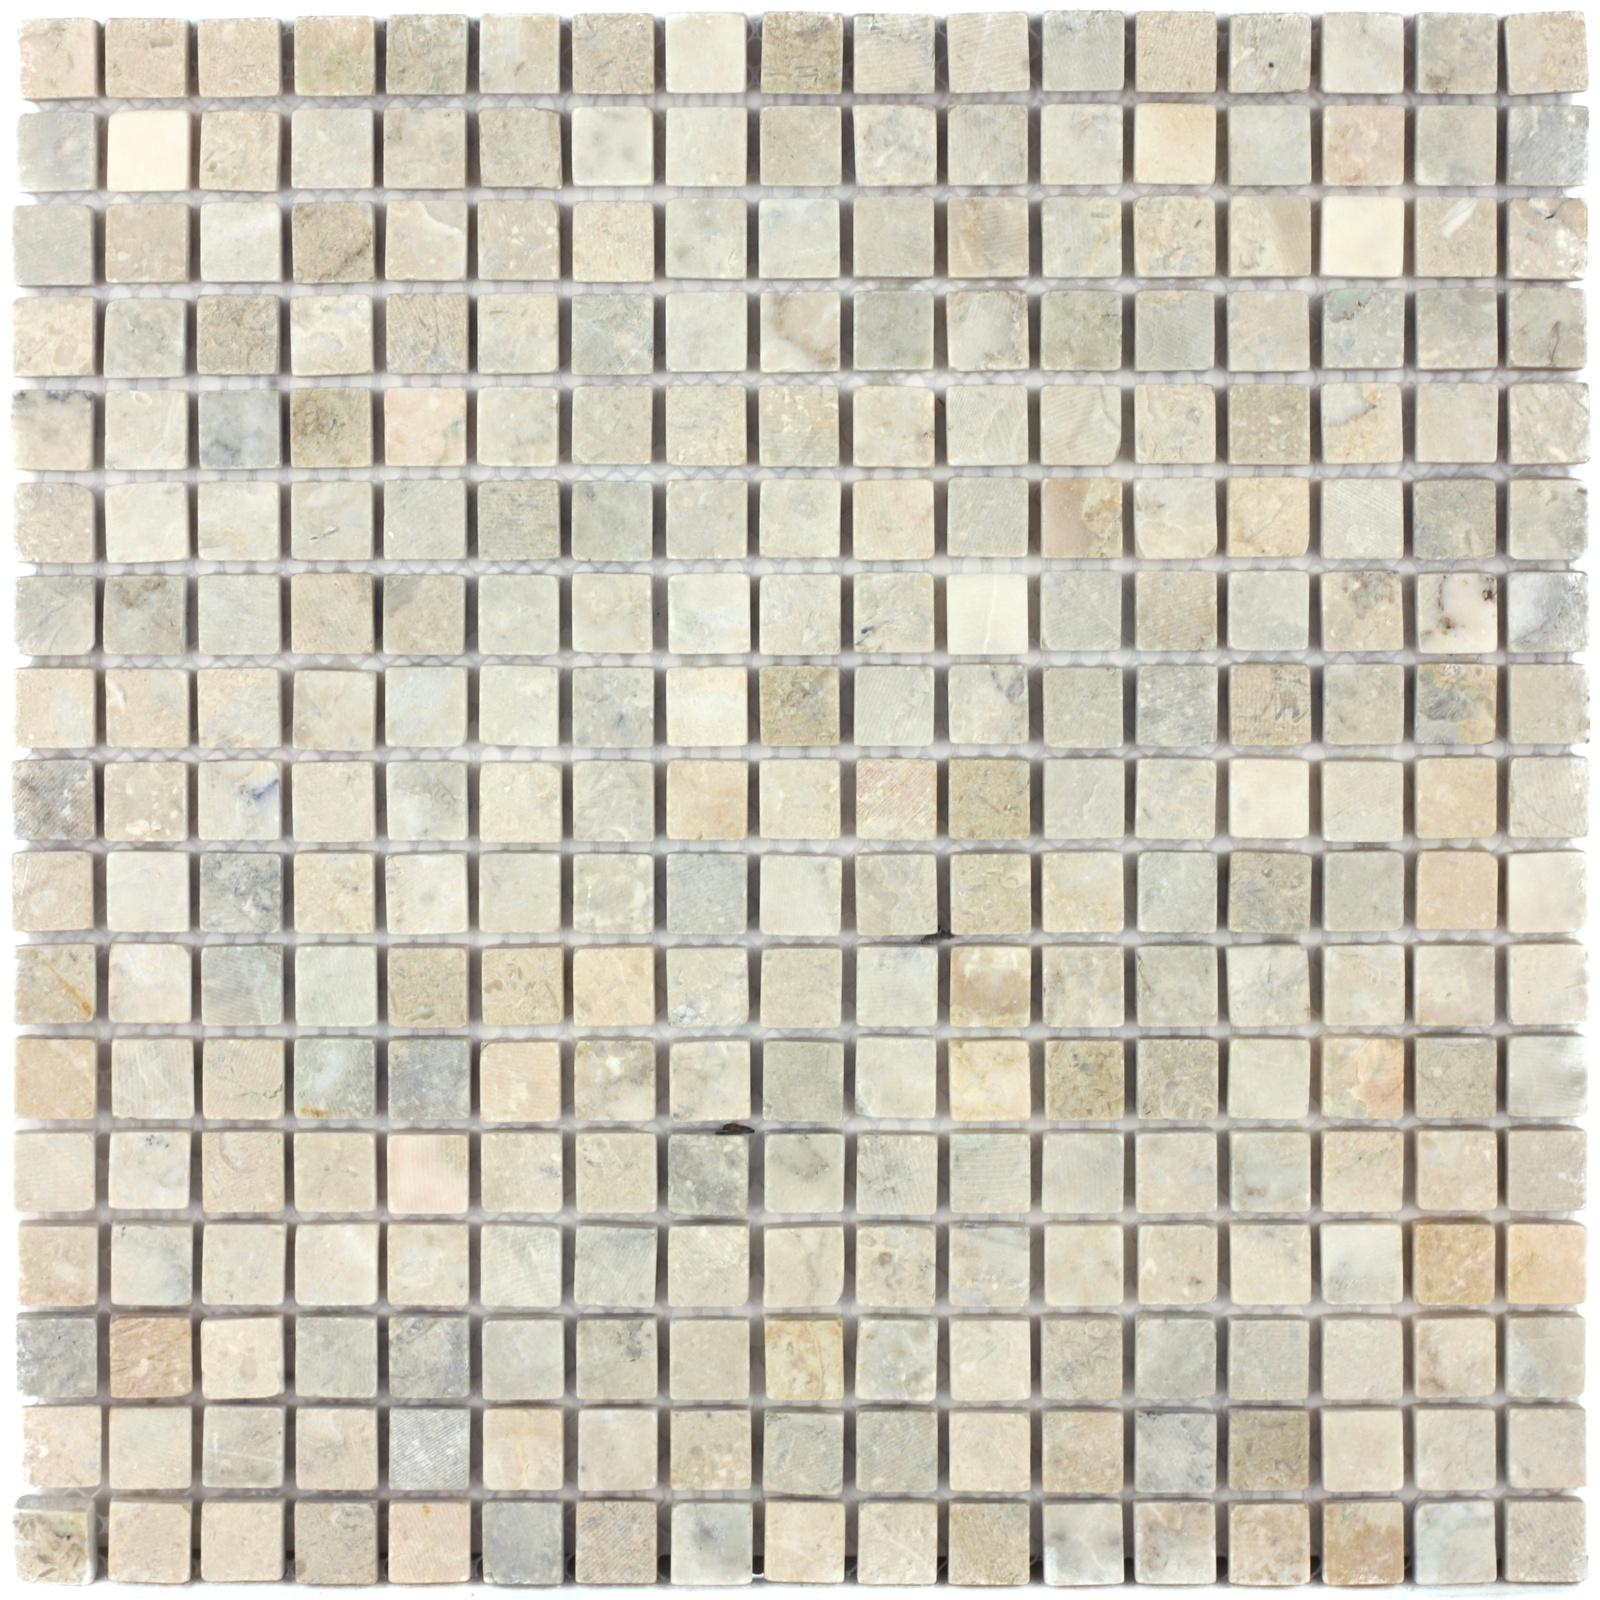 Мозаика из натурального камня Cappuccino grigio MAT 15x15x7